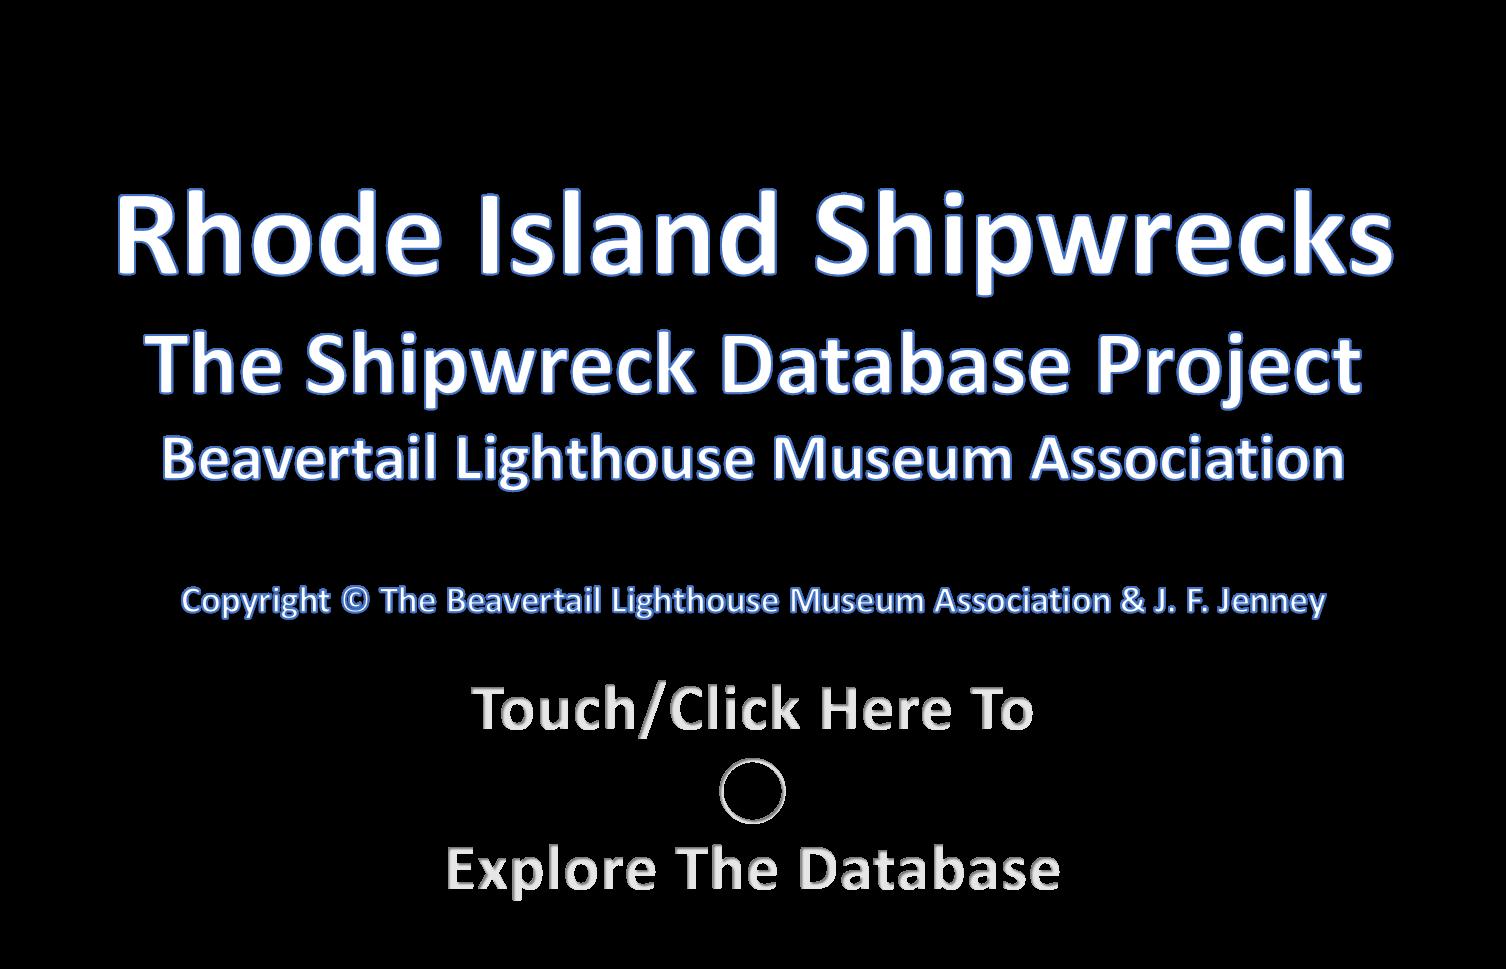 Rhode island shipwrecks nvjuhfo Image collections